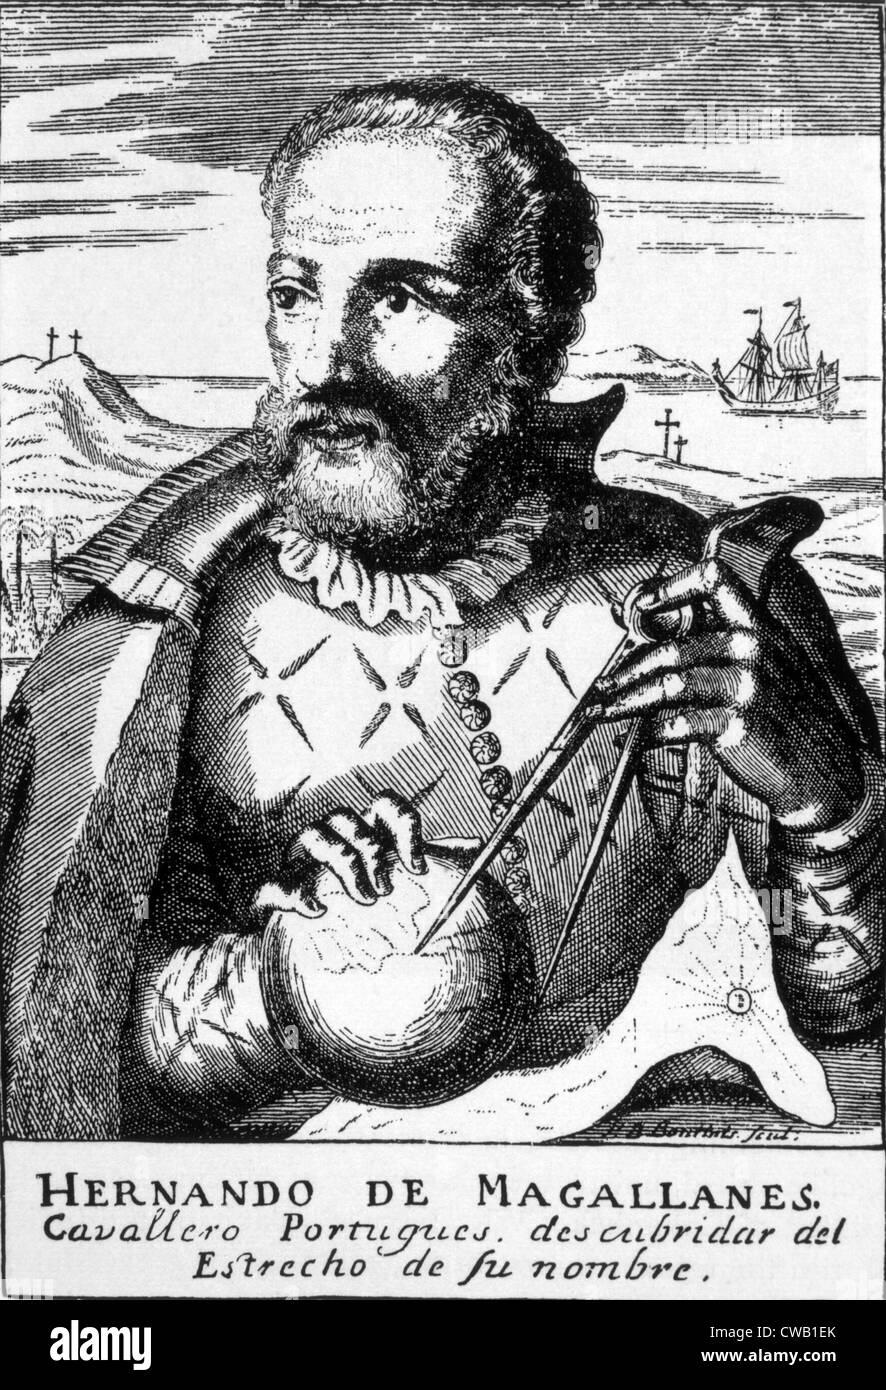 Ferdinand Magellan (1480-1521) - Stock Image